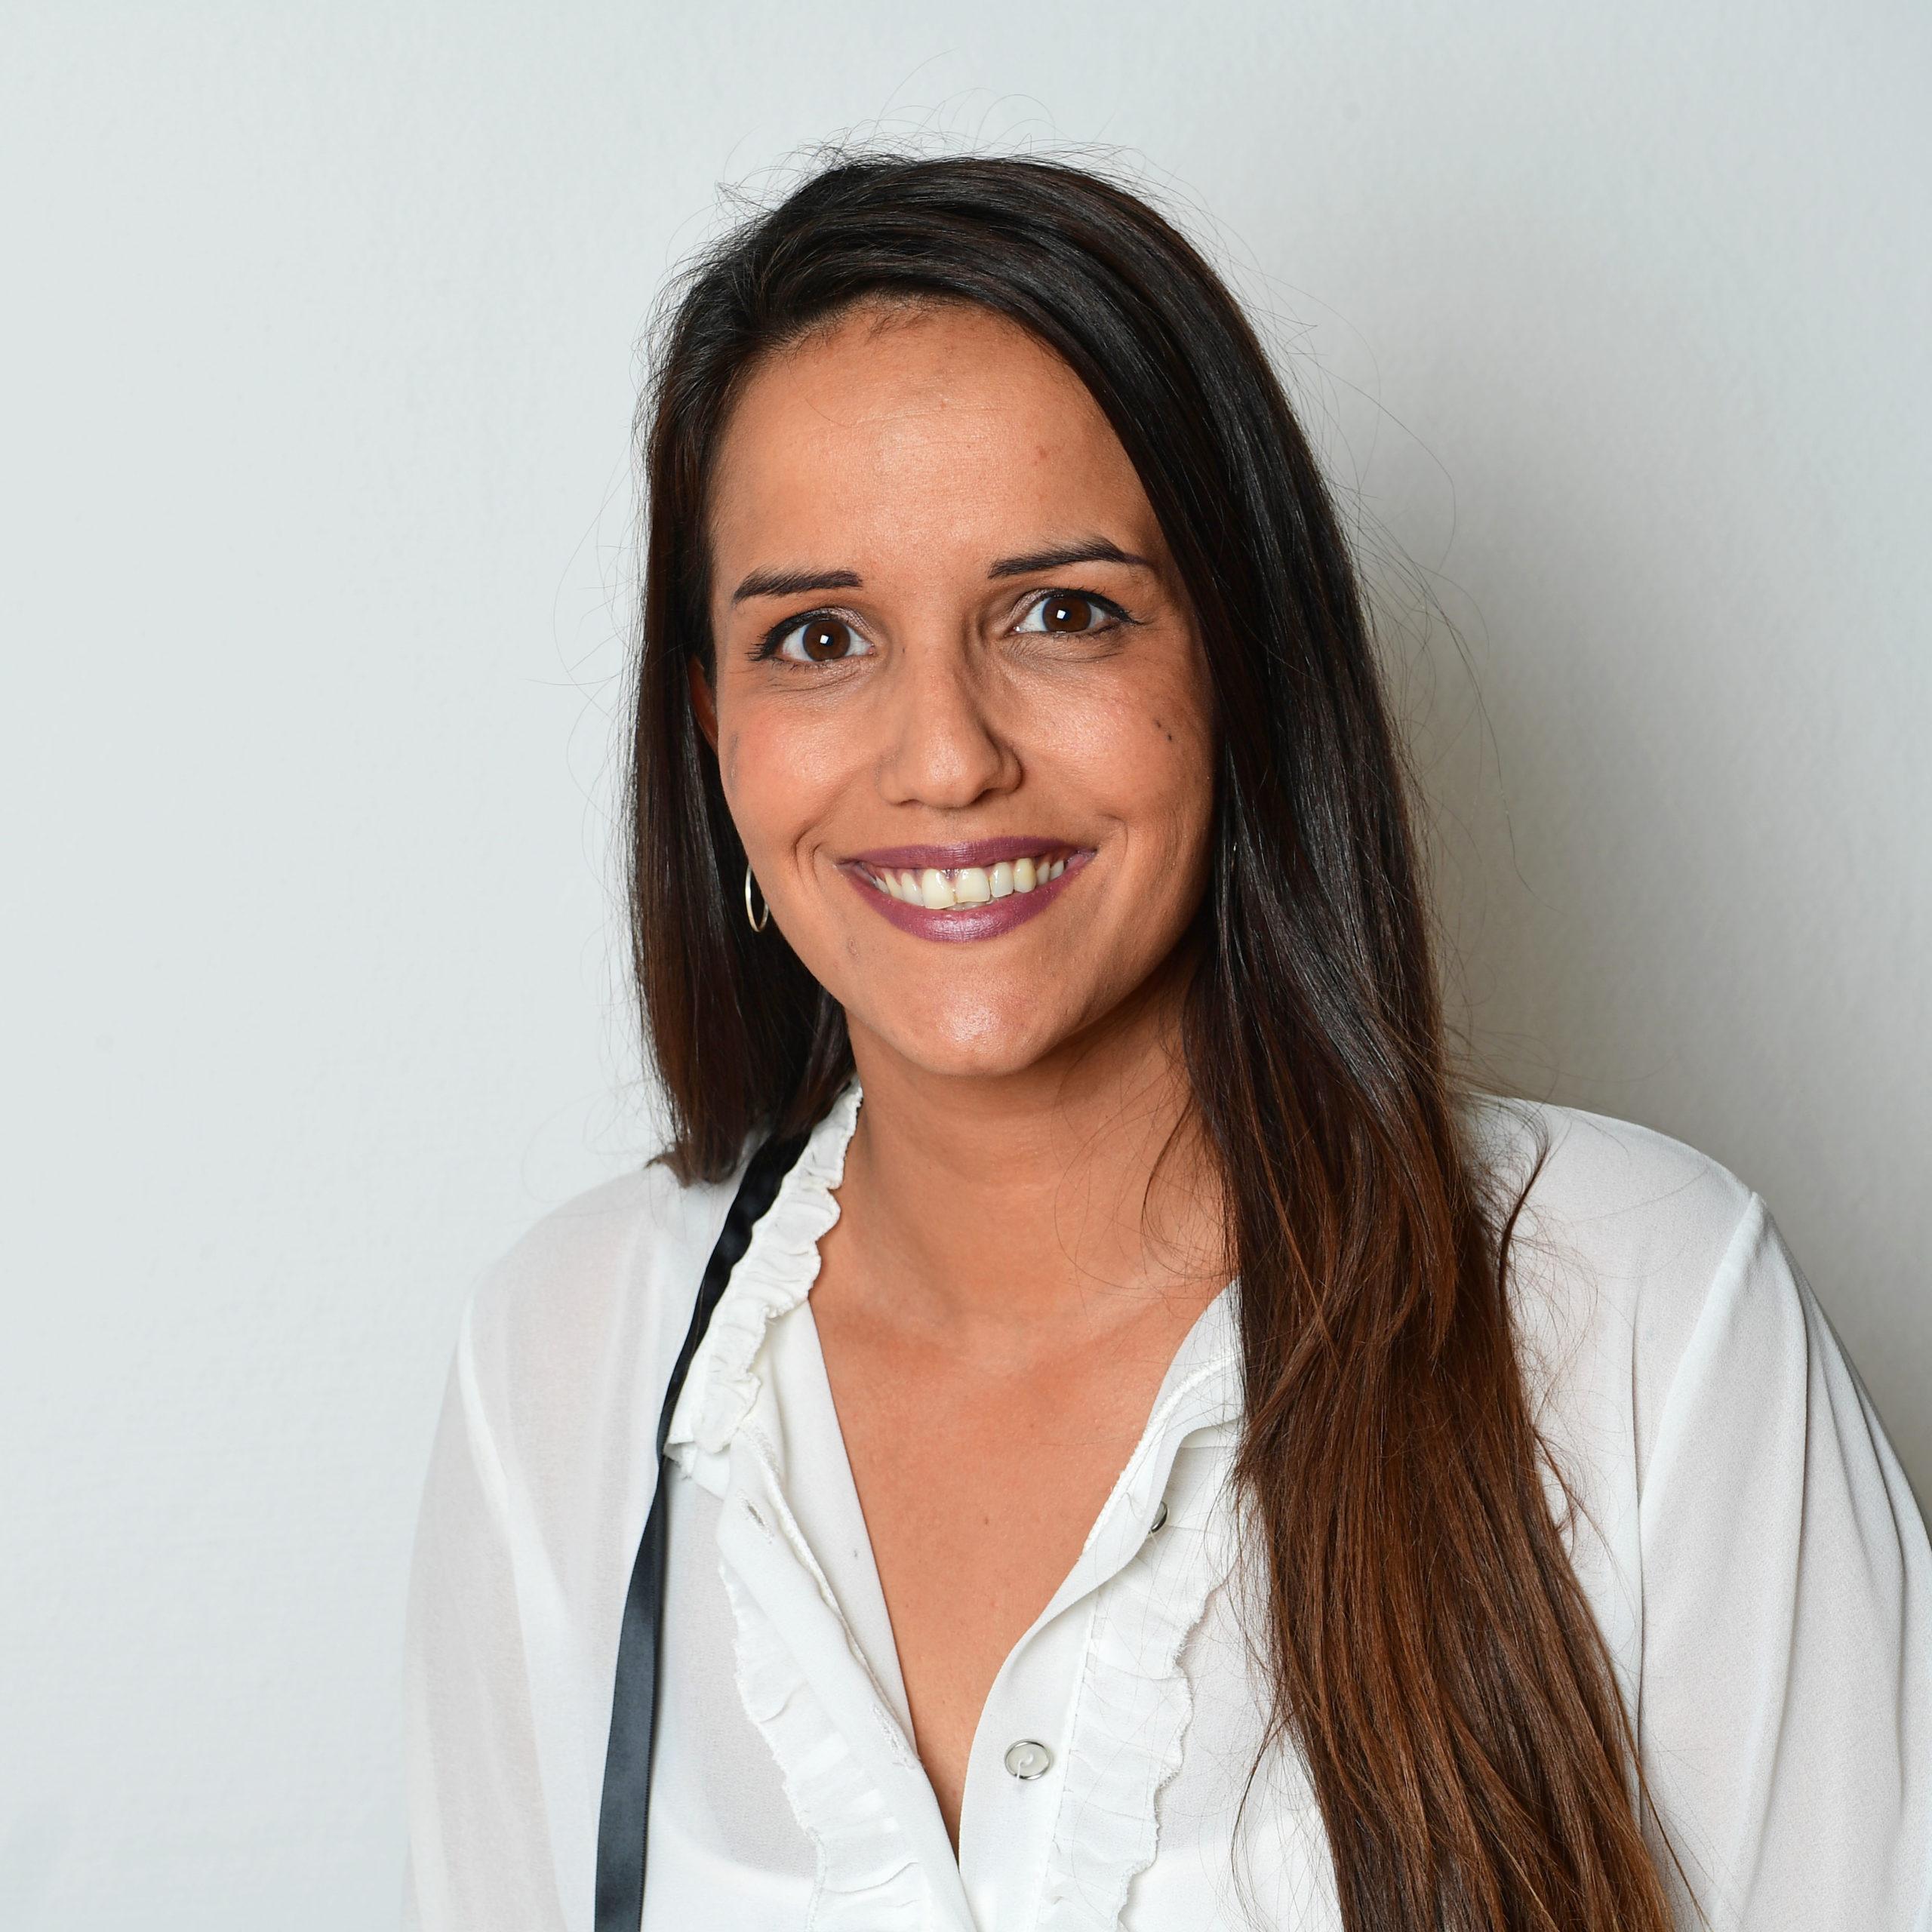 Melanie Piteira